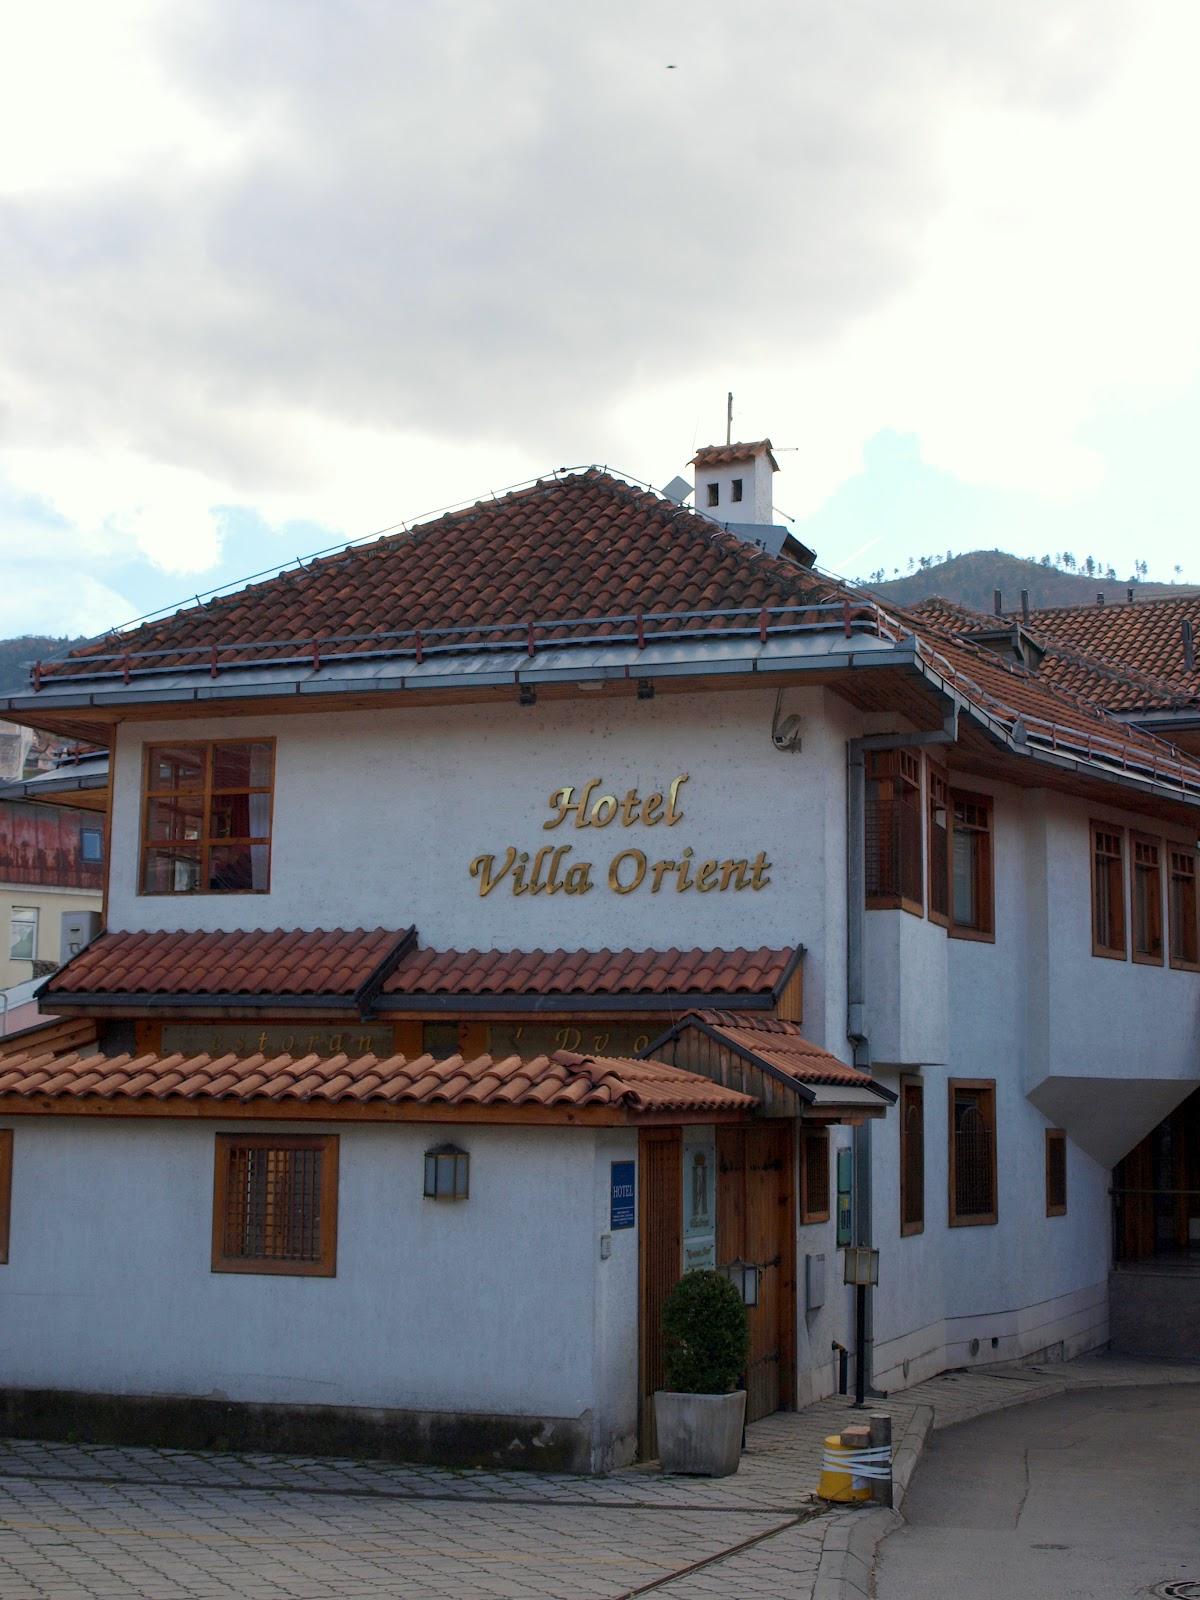 the traveler 39 s drawer hotel villa orient sarajevo bosnia i hercegovina. Black Bedroom Furniture Sets. Home Design Ideas